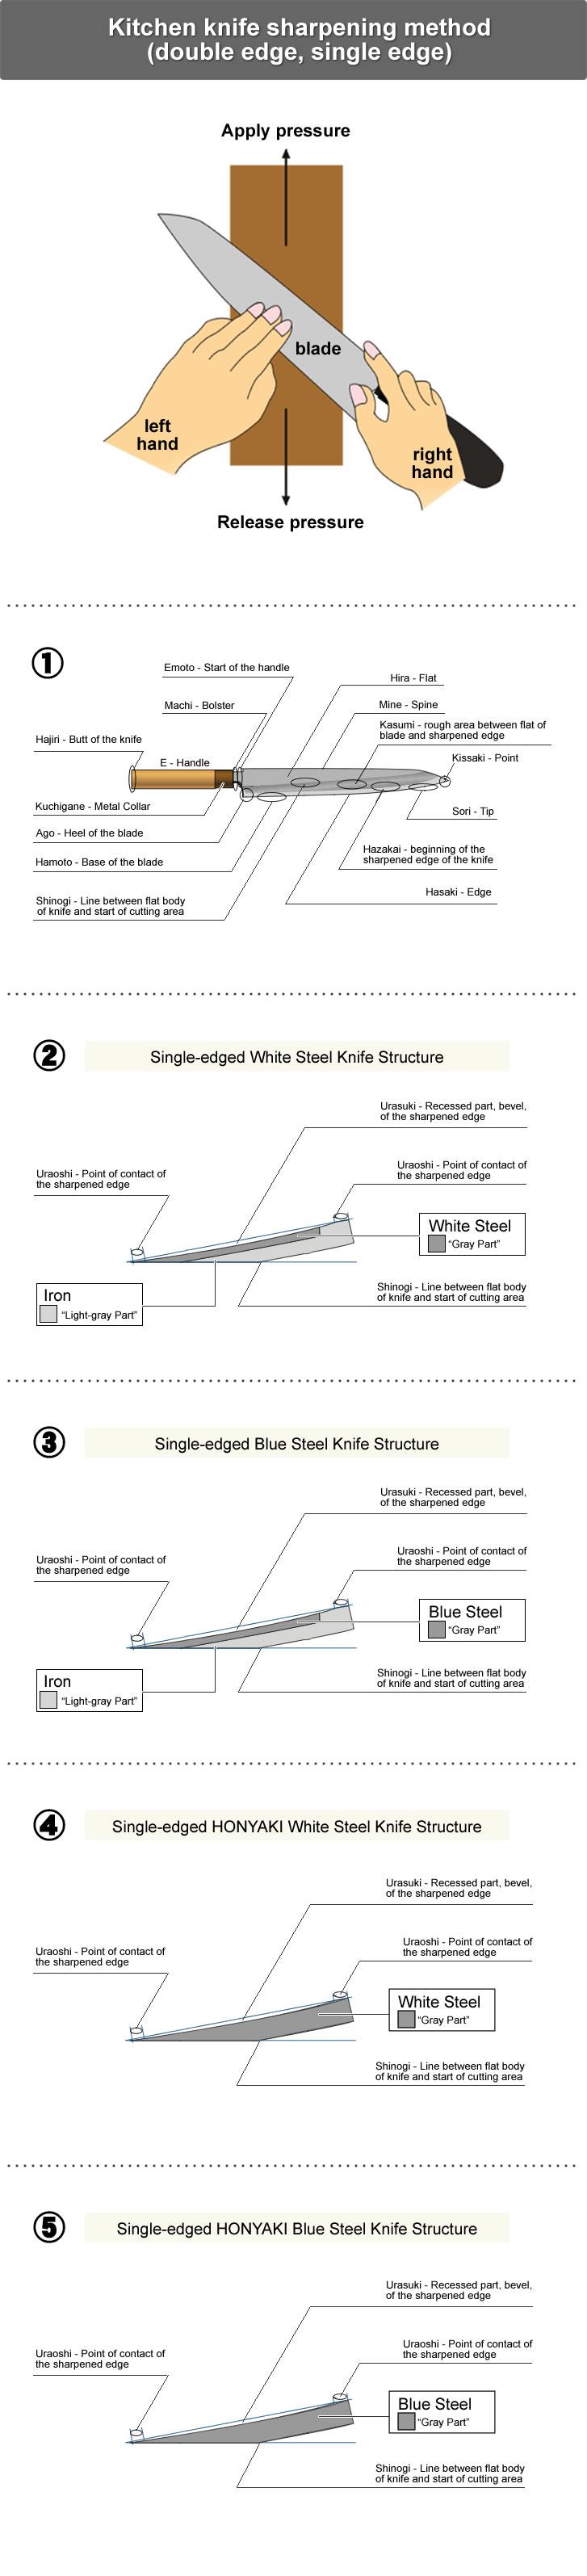 Kitchen knife sharpening method - double edge, single edge